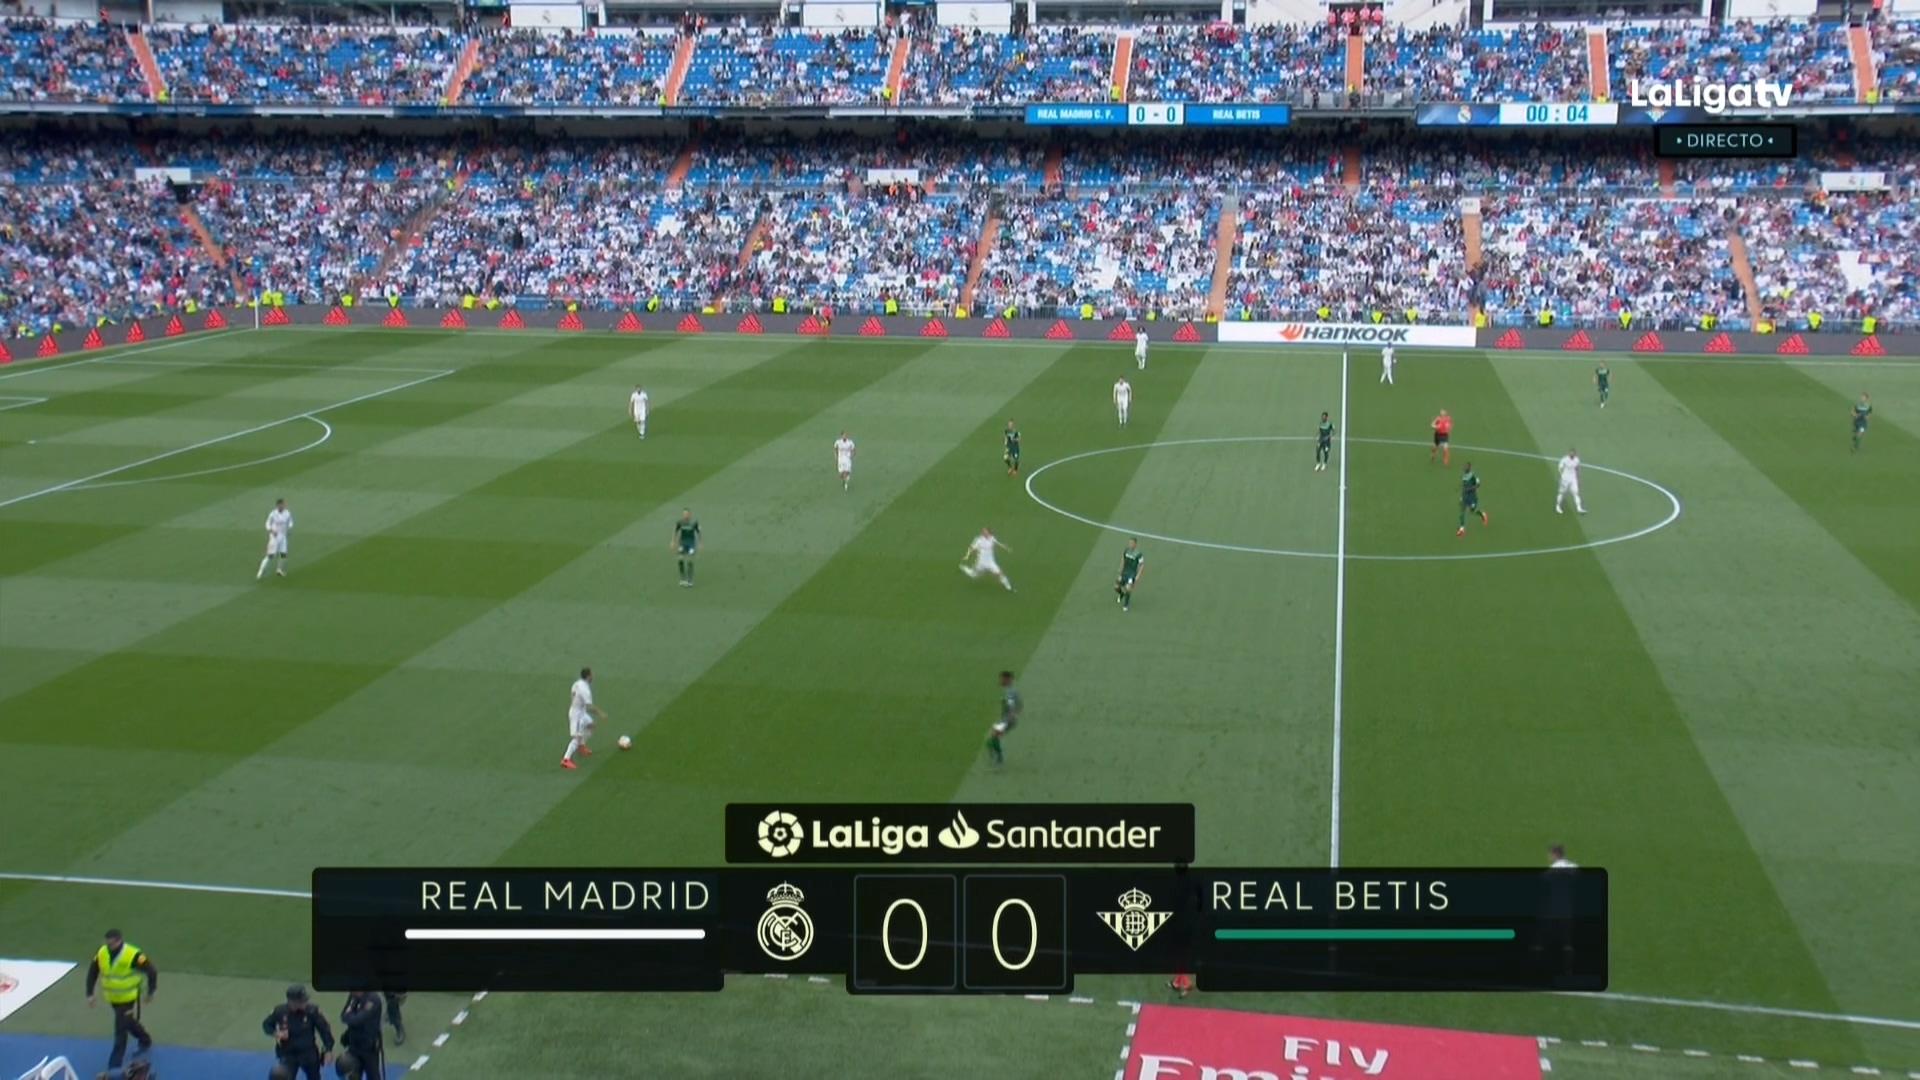 Xem lại: Real Madrid vs Real Betis